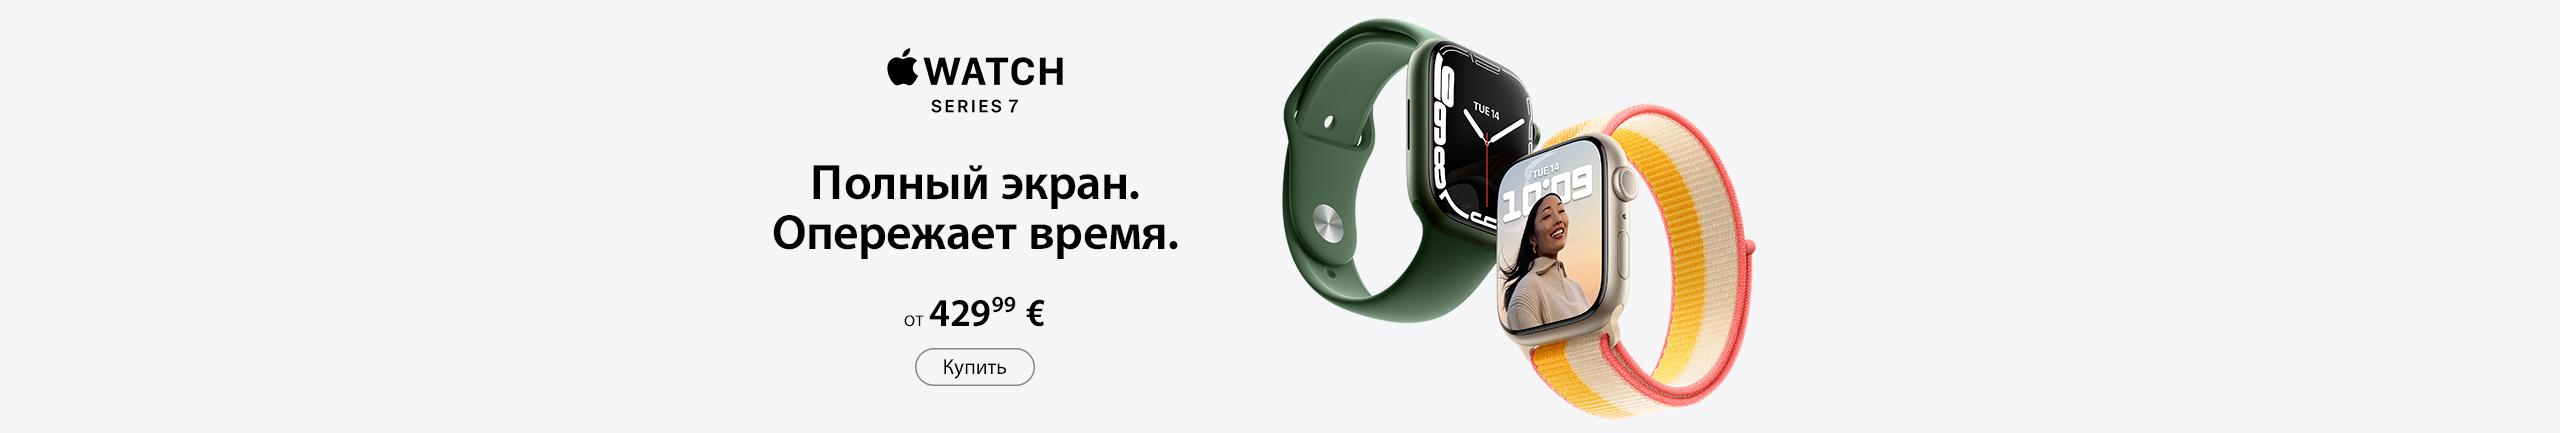 NPL  Купите Apple Watch Series 7